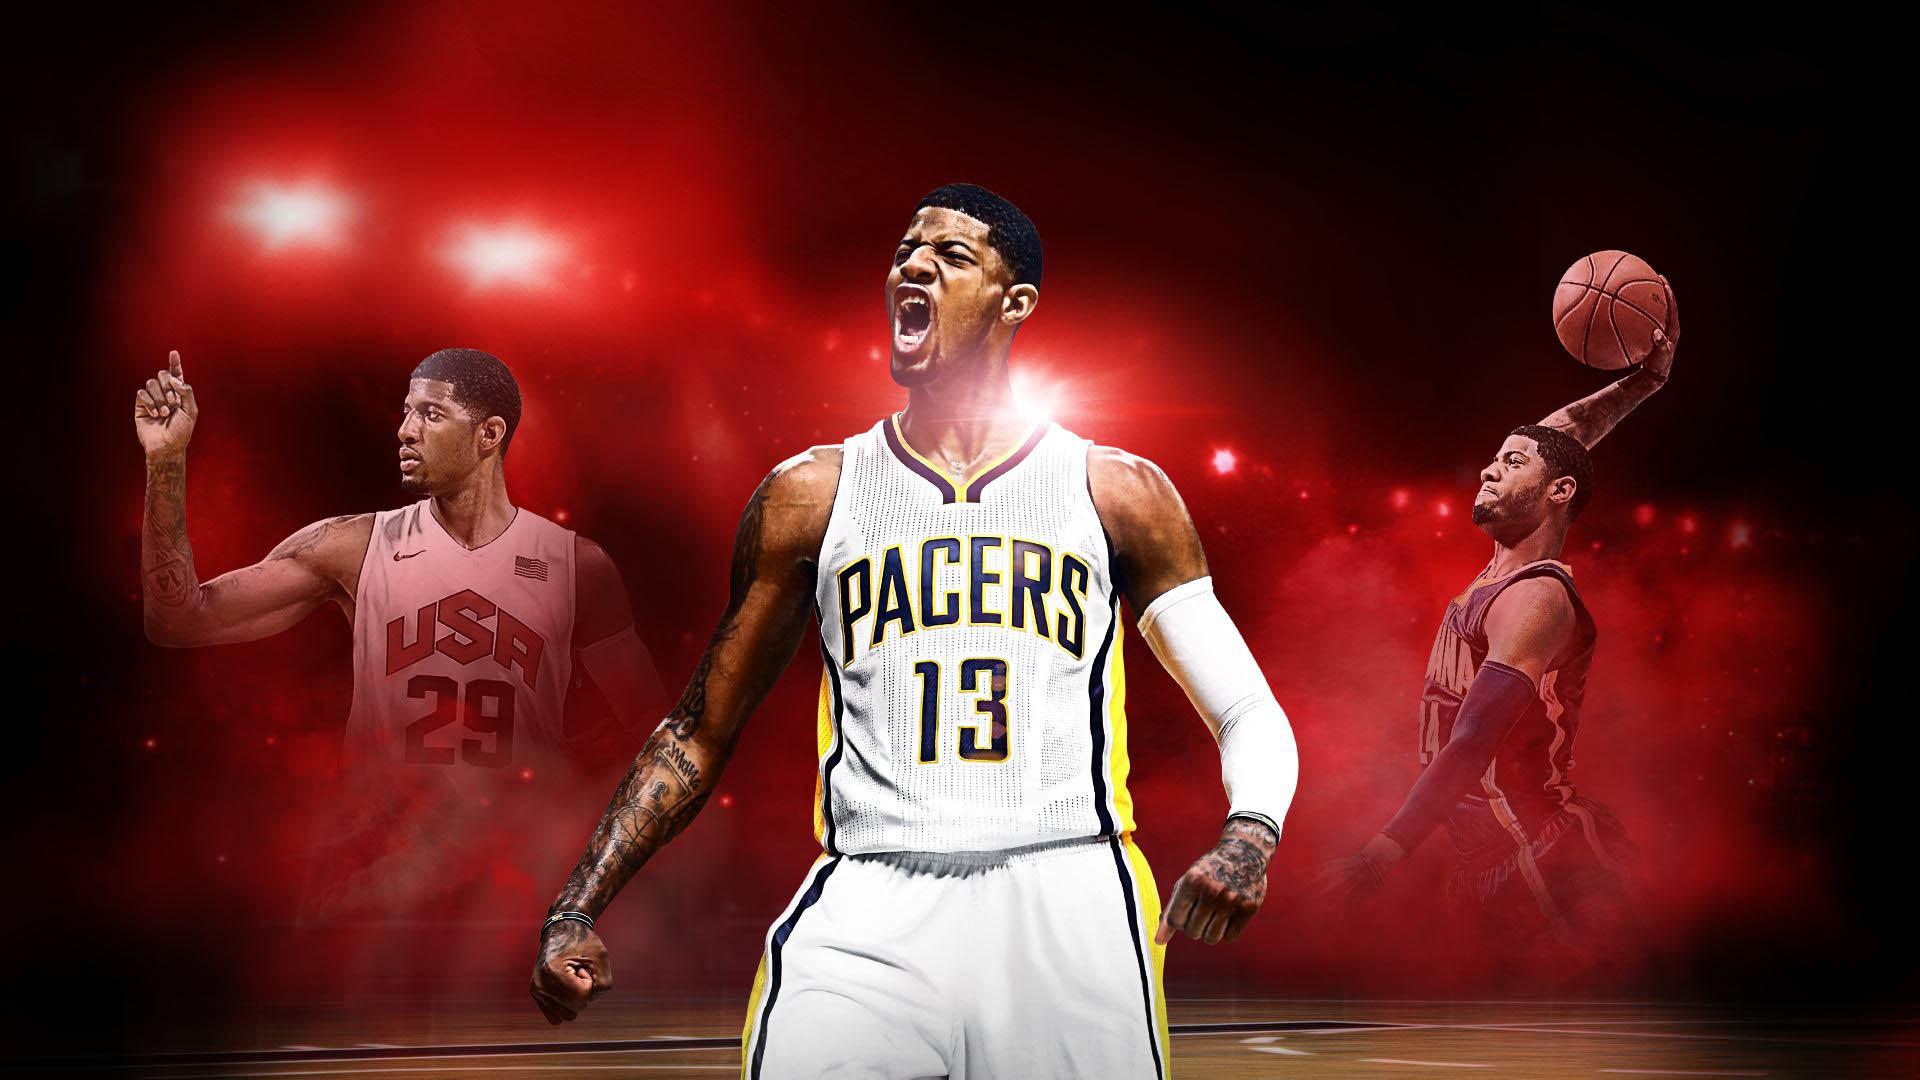 NBA Superstar Paul George Graces Cover of NBA 2K17